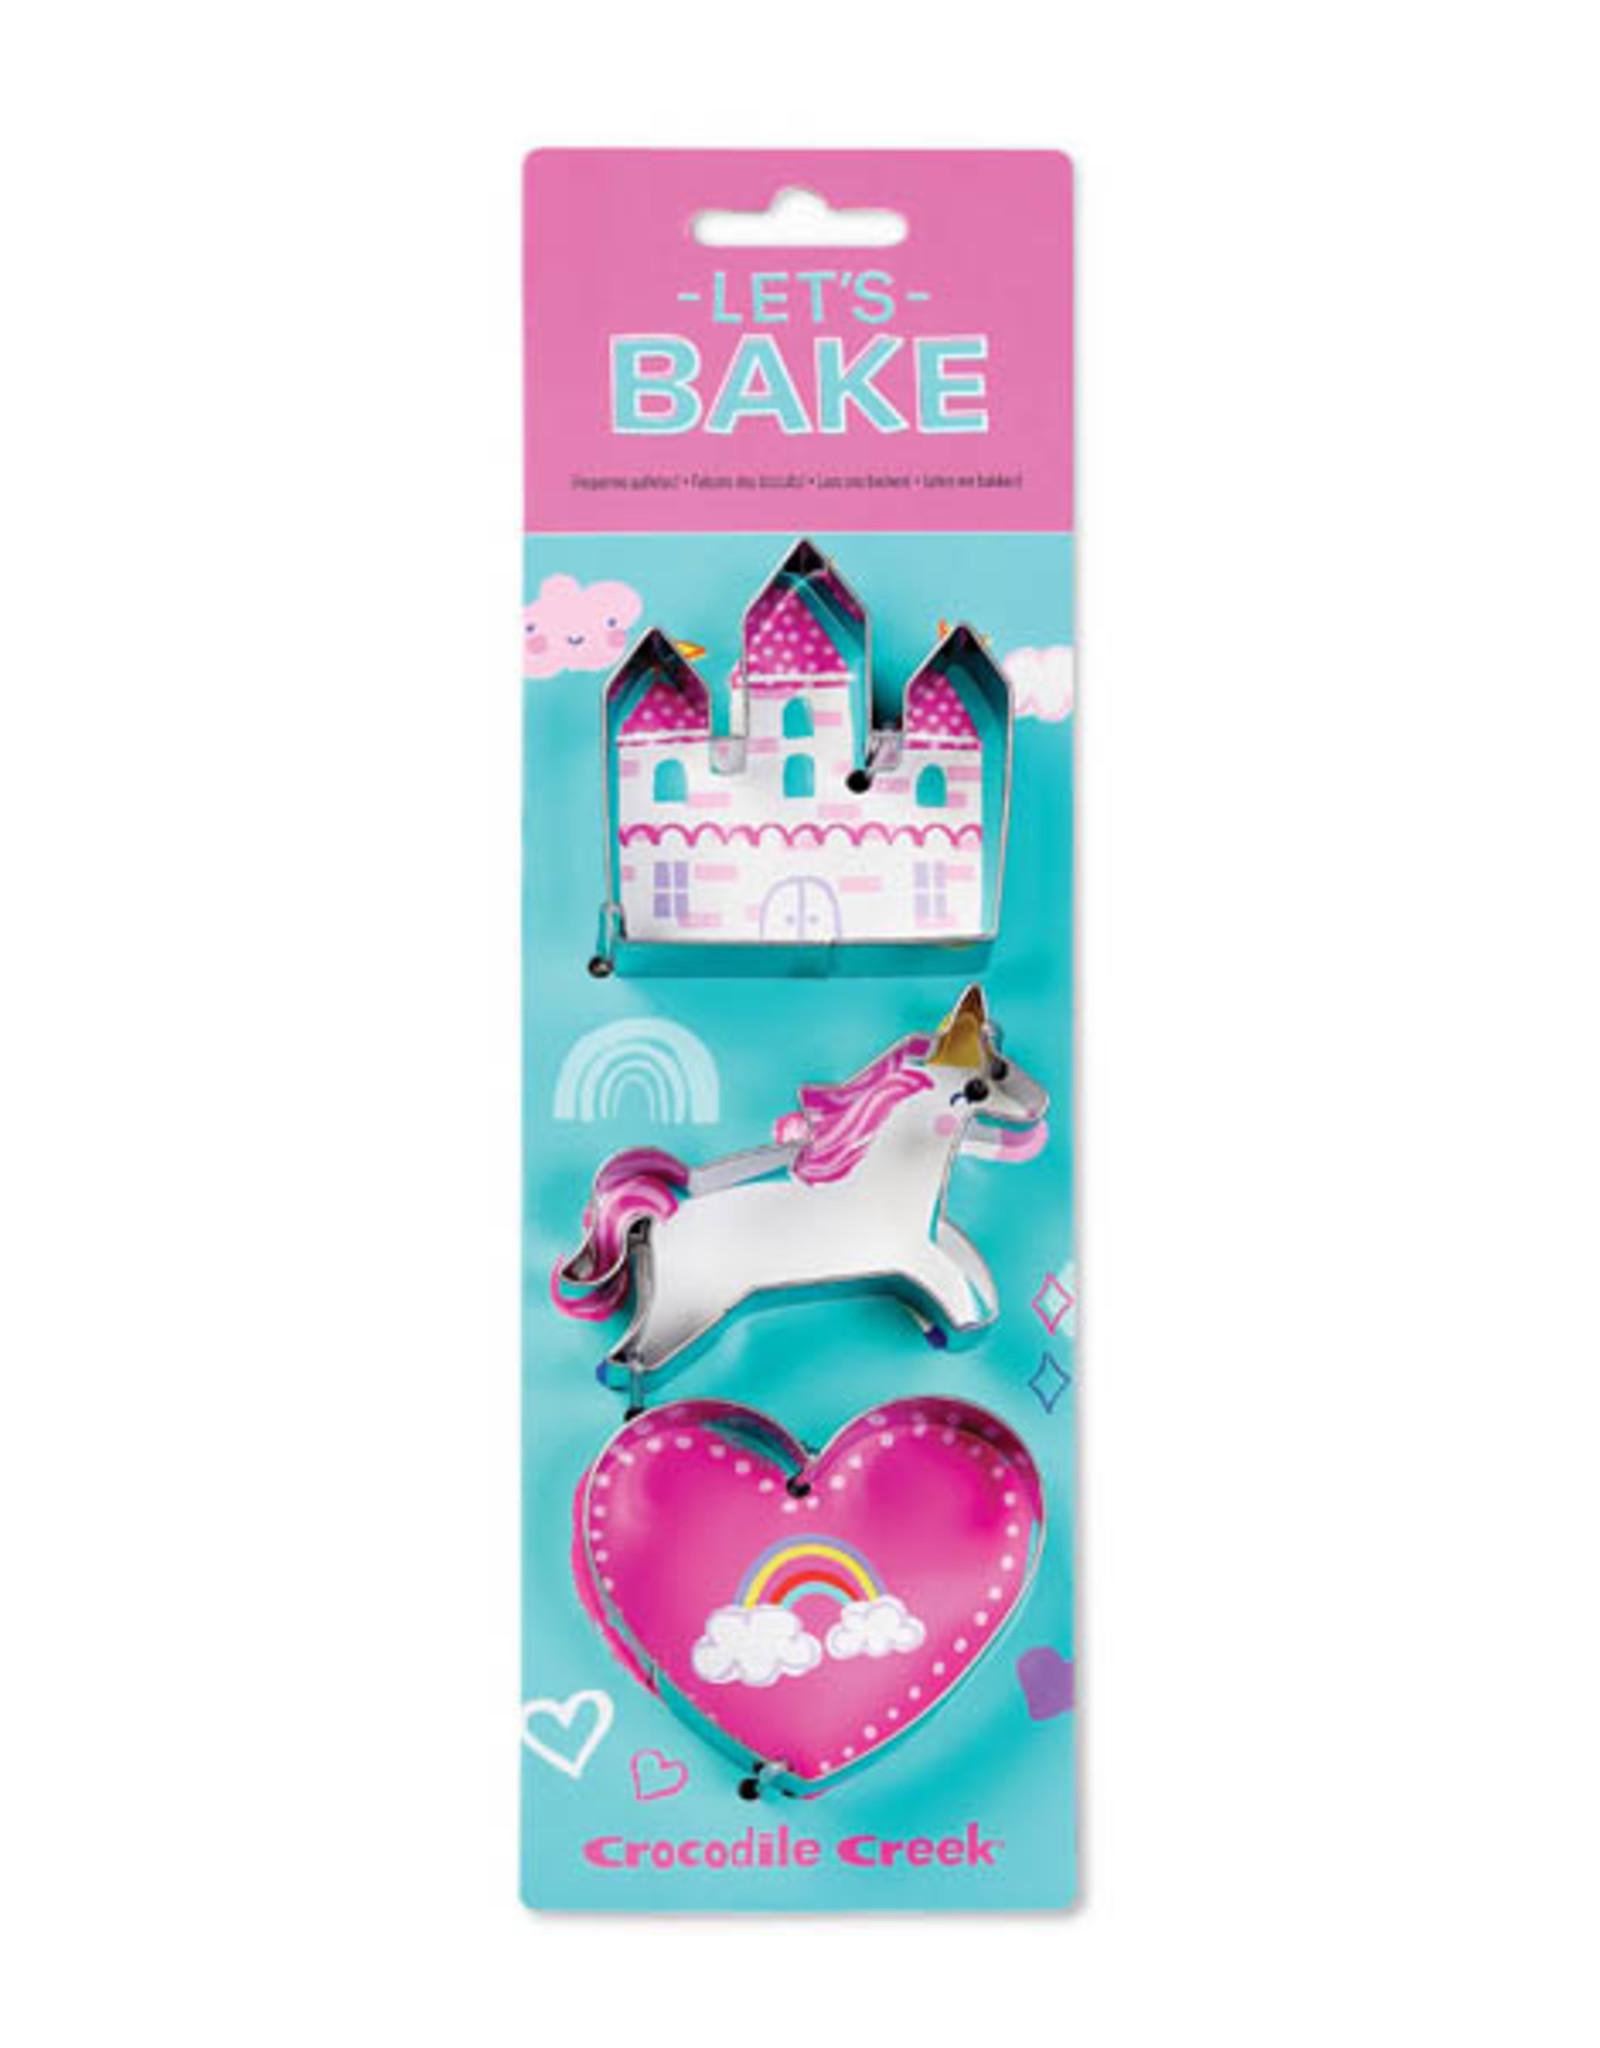 Crocodile Creek Let's Bake Cookie Cutter Set - Unicorn